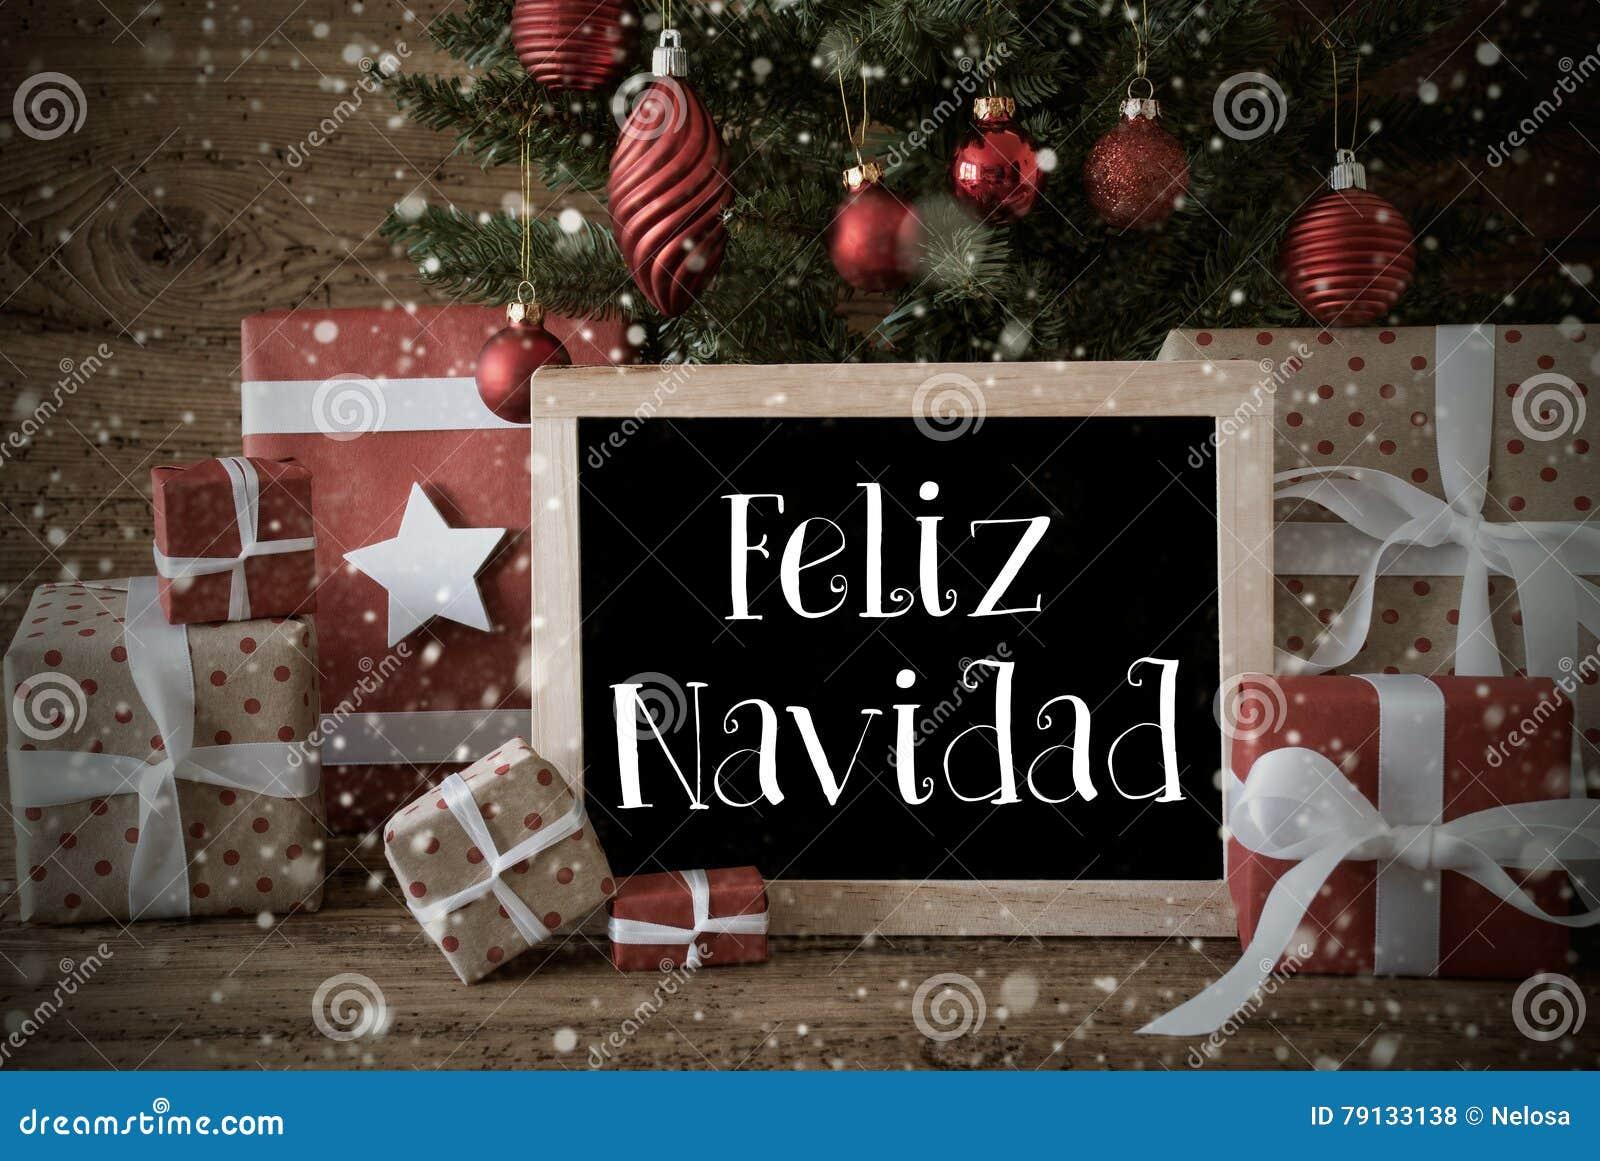 Nostalgic Tree Snowflakes Feliz Navidad Means Merry Christmas